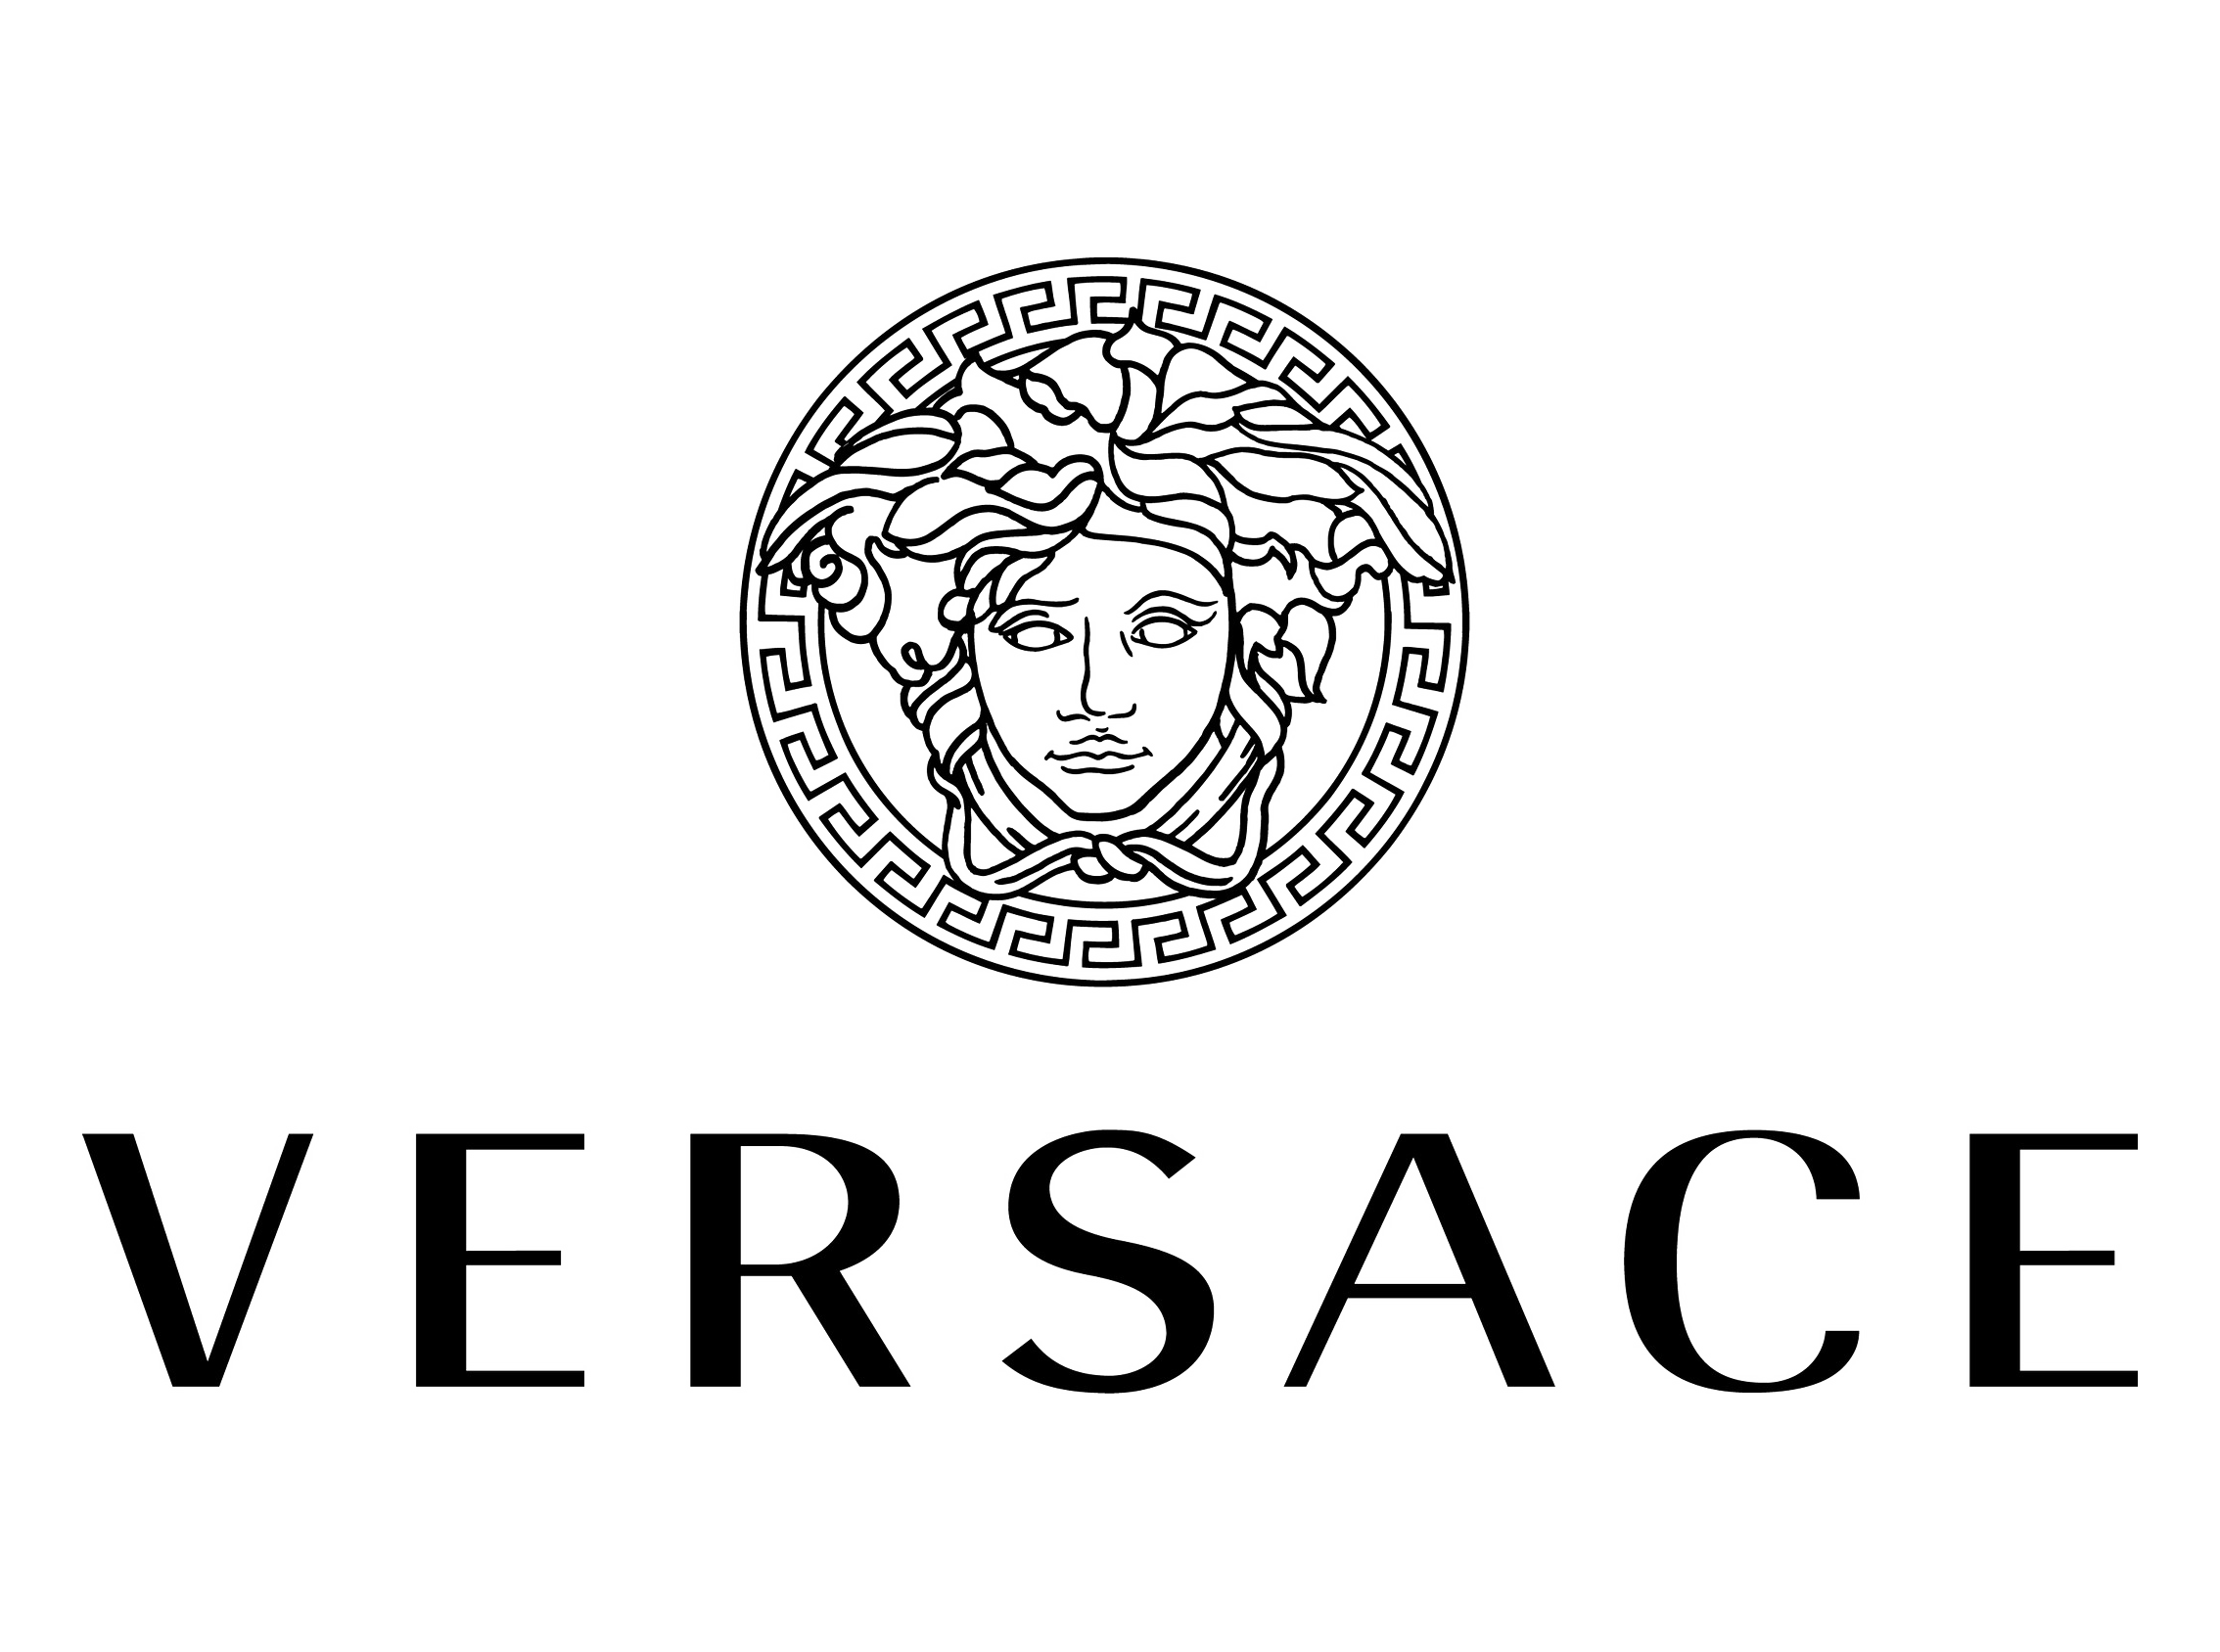 versace logo レトロ